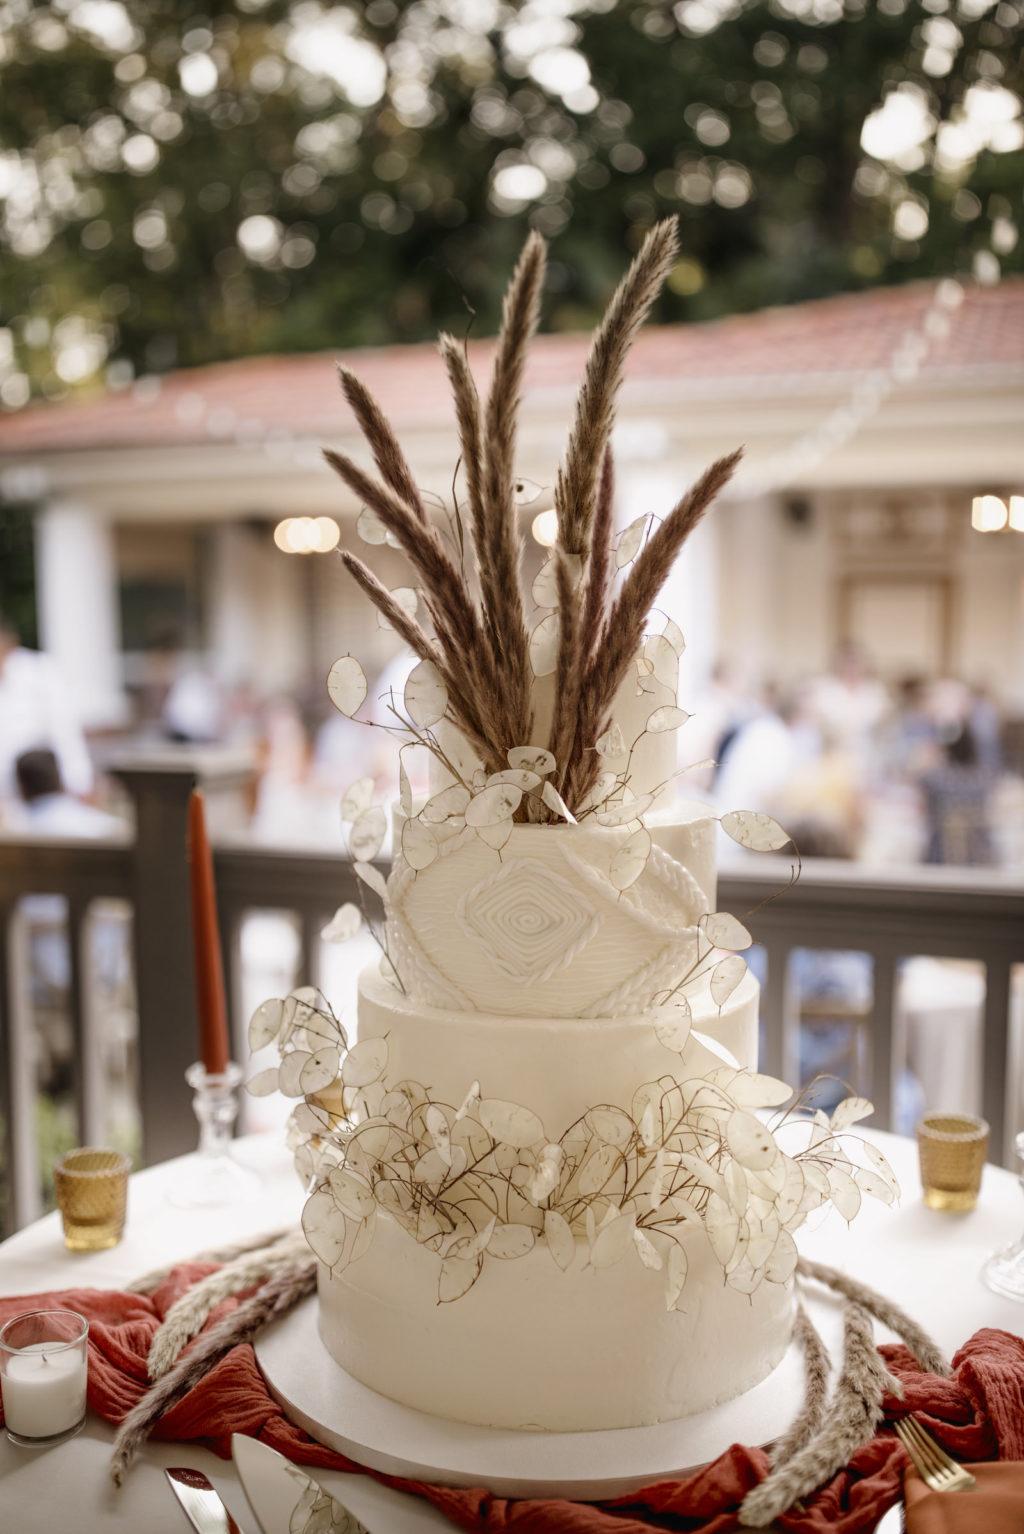 Three Tiered Round Wedding Cake with Intricate Natural Pampas Grass Detailing   Boho Wedding Cake Topper